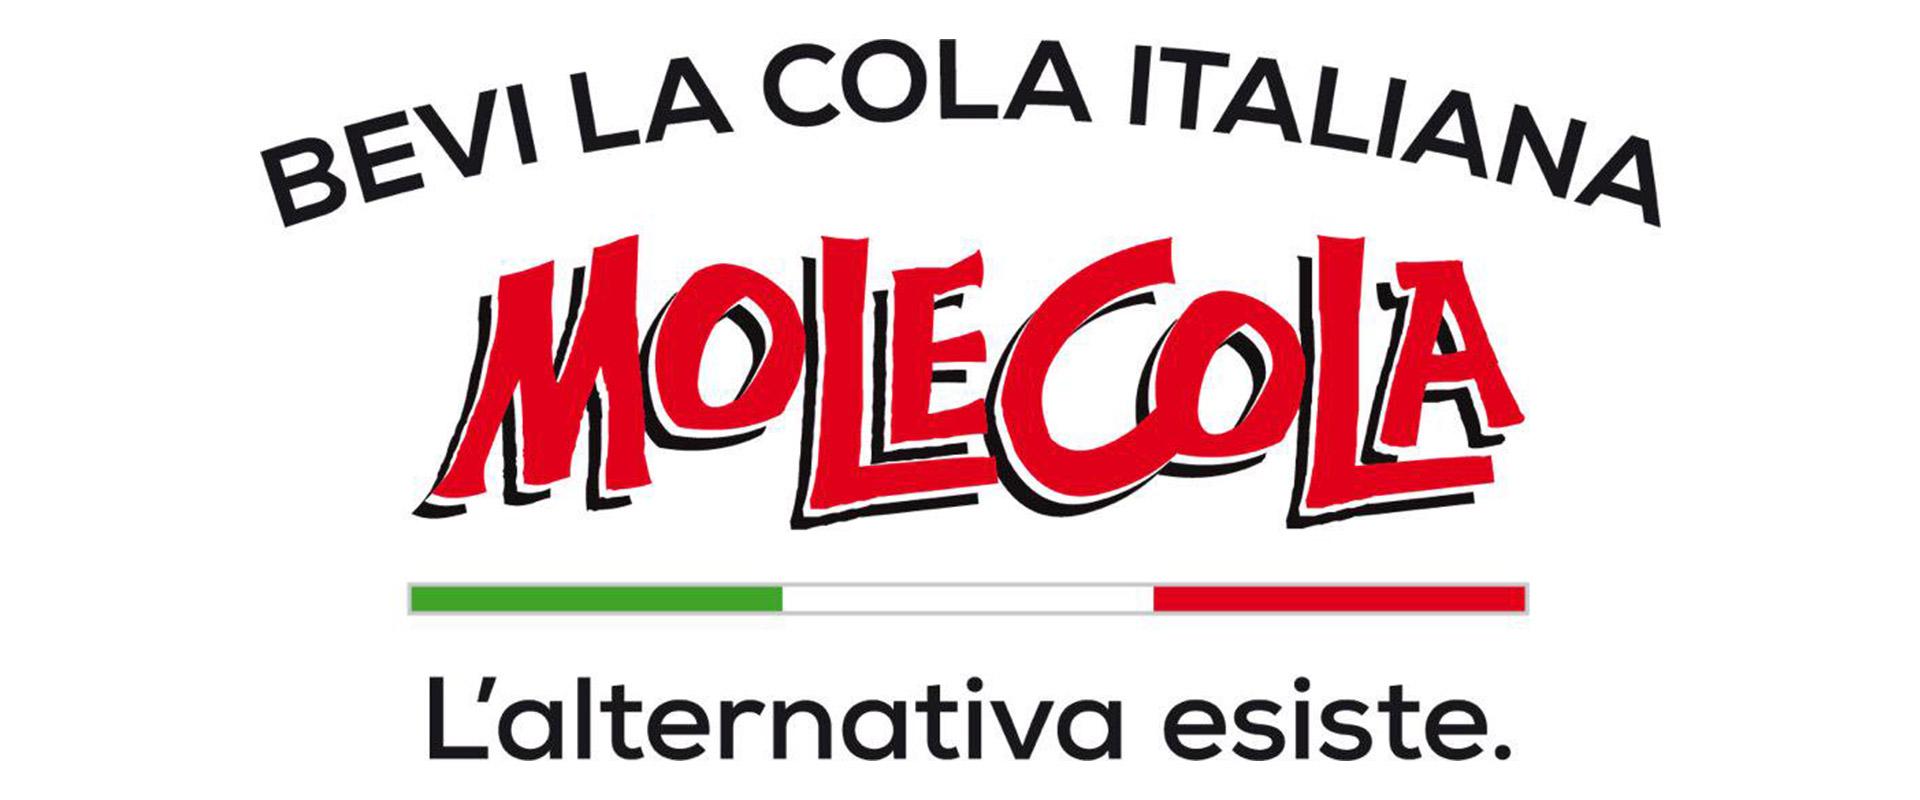 Molecola 90-60-90: l'alternativa italiana in vetro